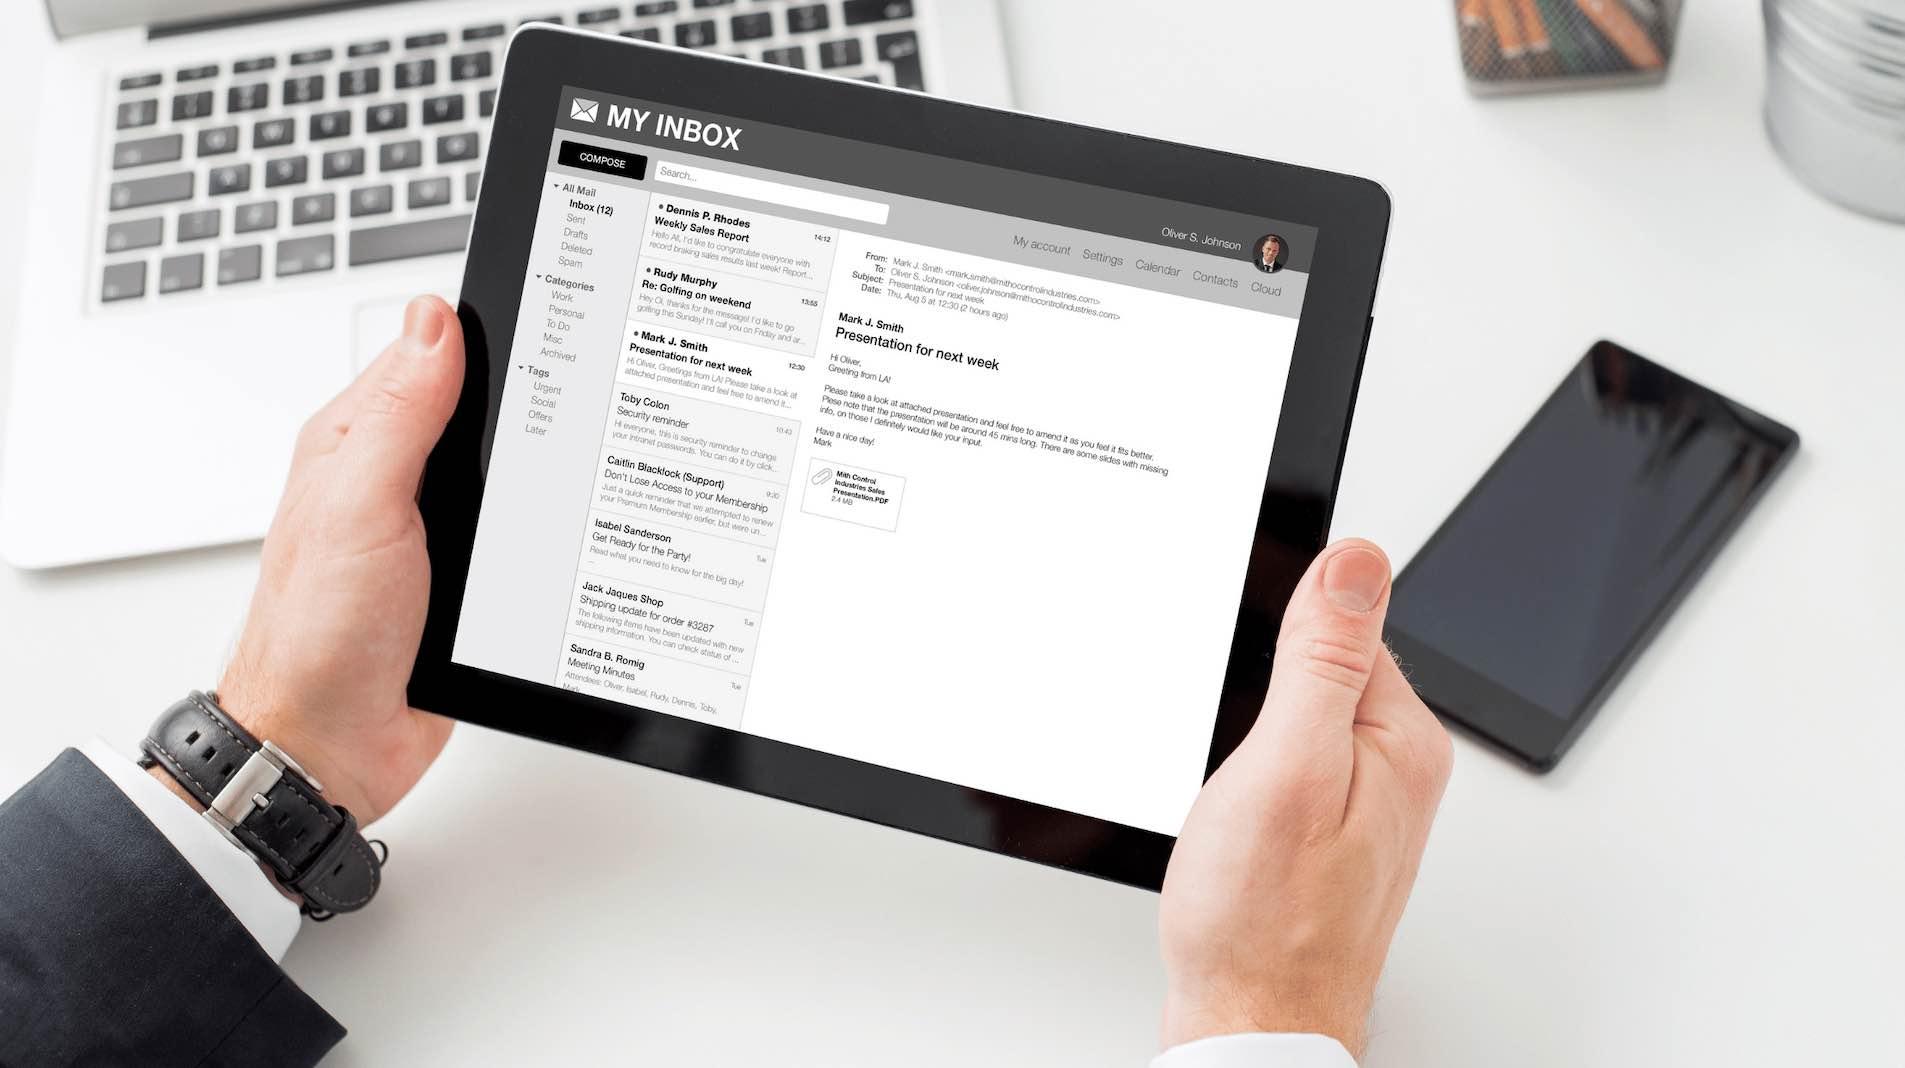 5 Simple Strategies For Achieving Inbox Zero